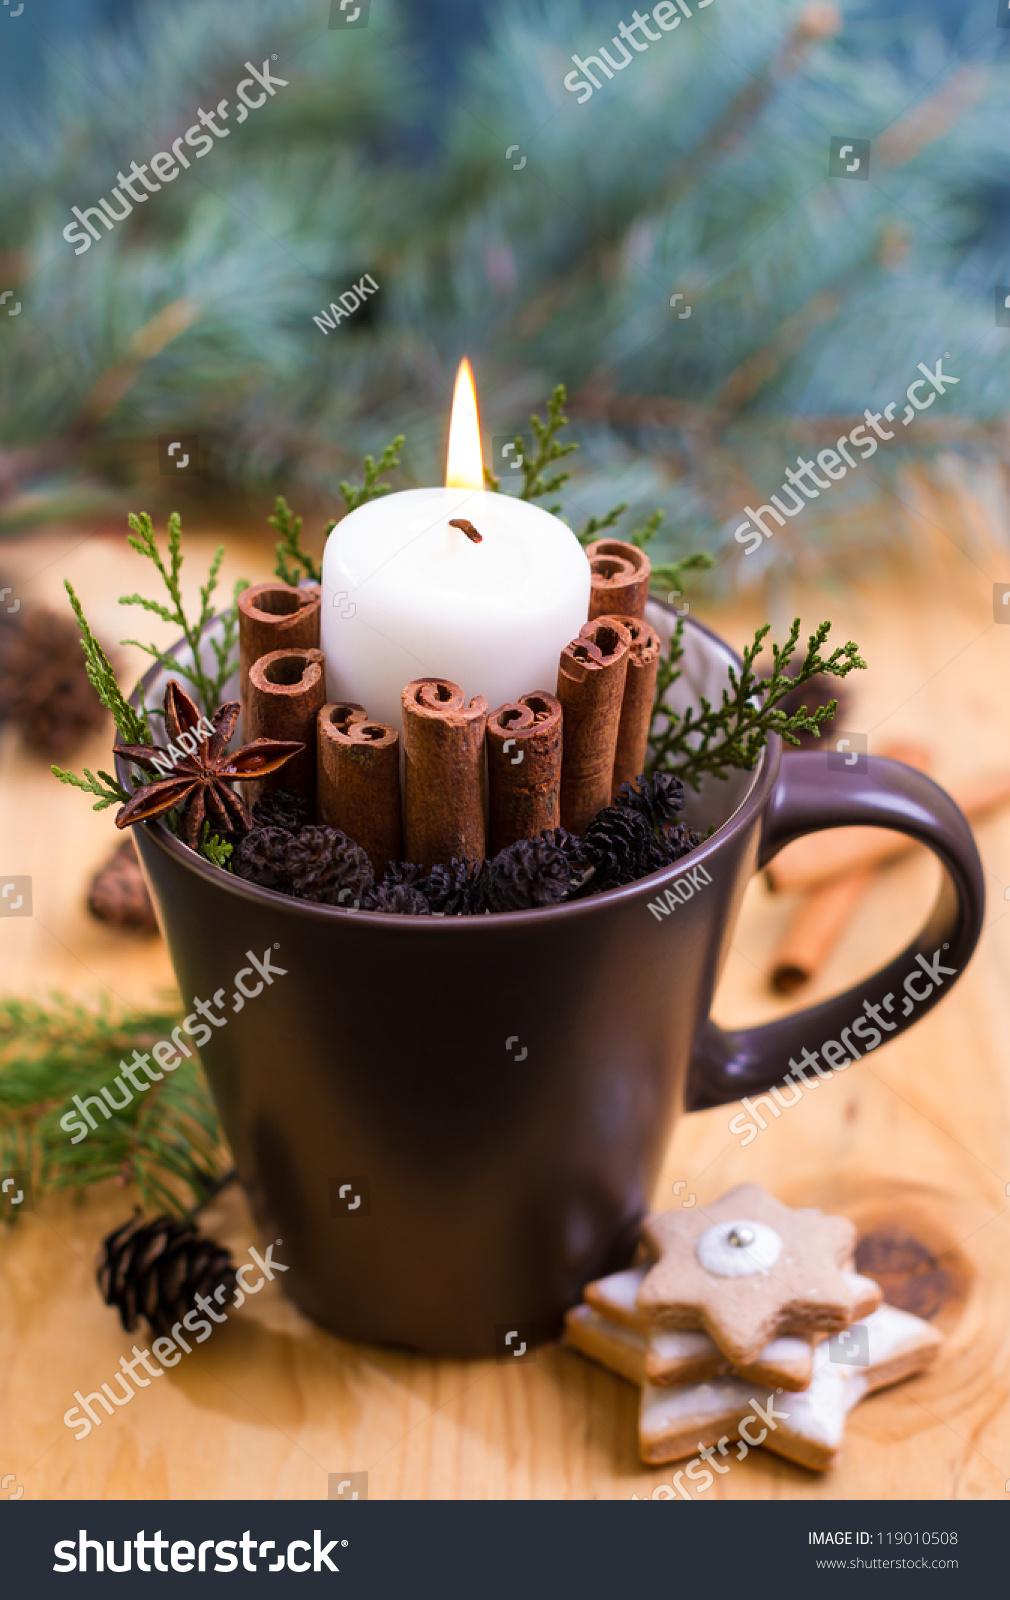 Homemade rustic christmas ornaments - Homemade Rustic Christmas Ornament Preview Save To A Lightbox